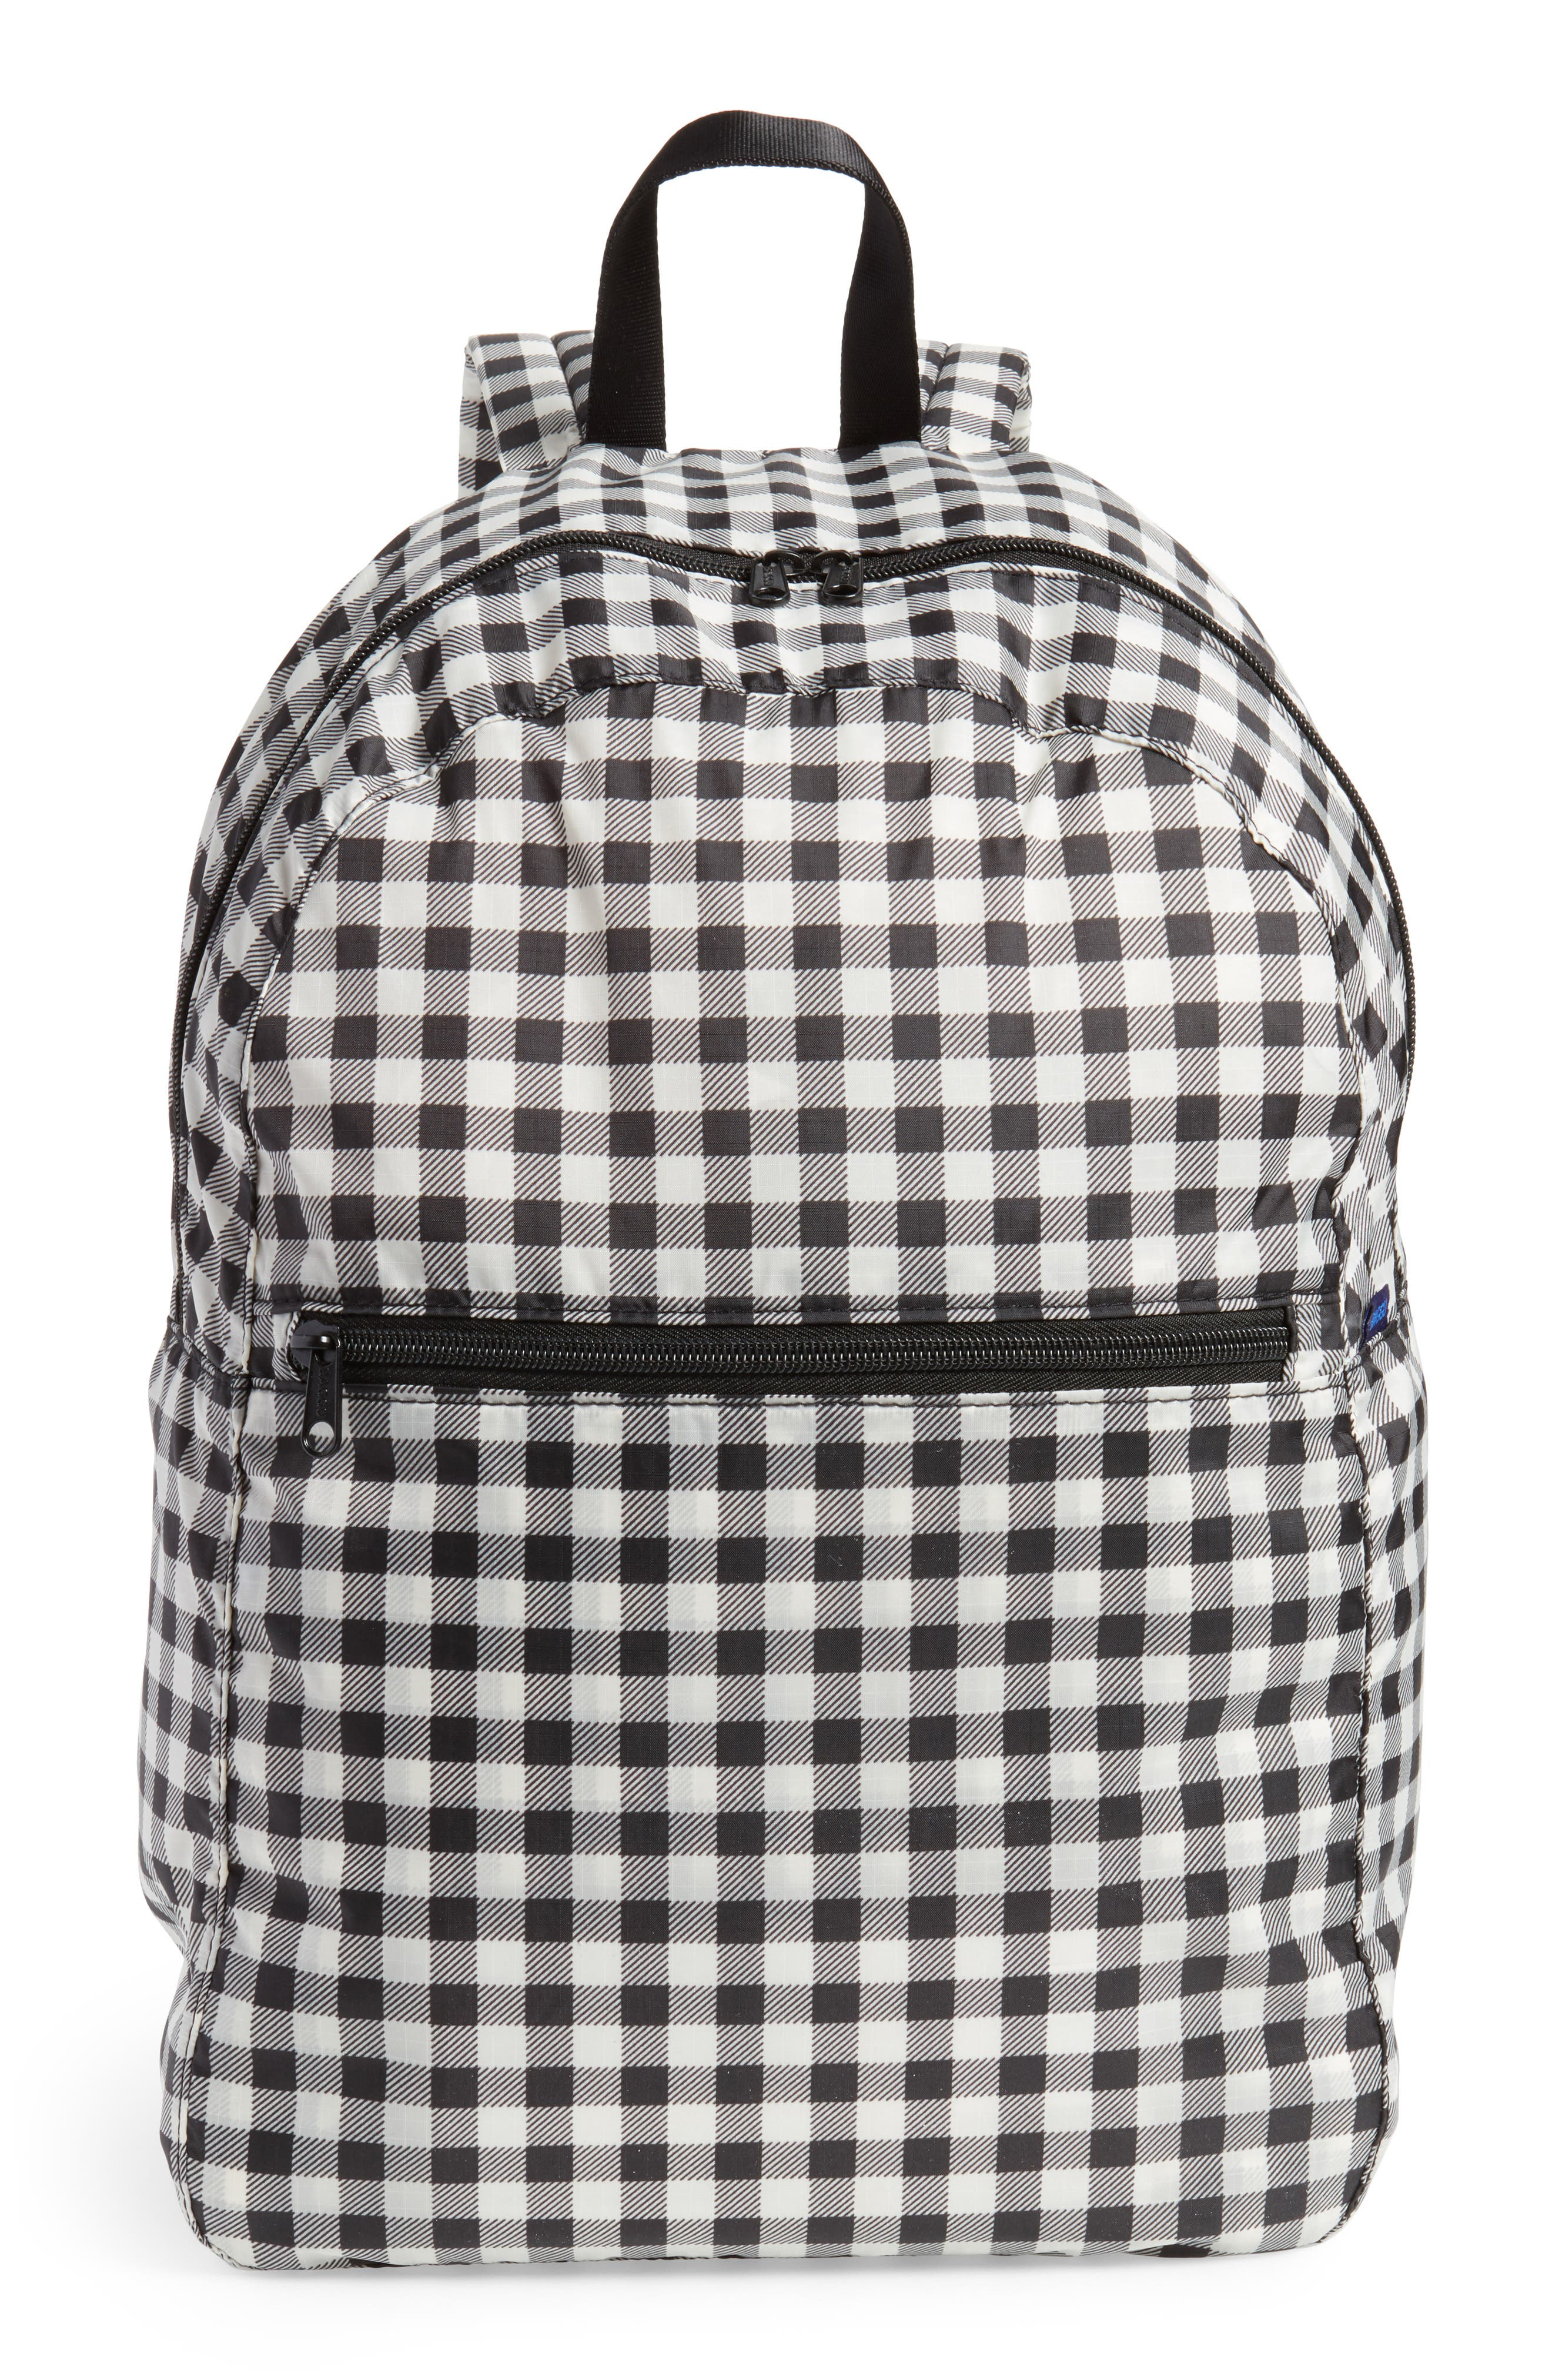 Ripstop Nylon Backpack,                             Main thumbnail 1, color,                             Black Gingham